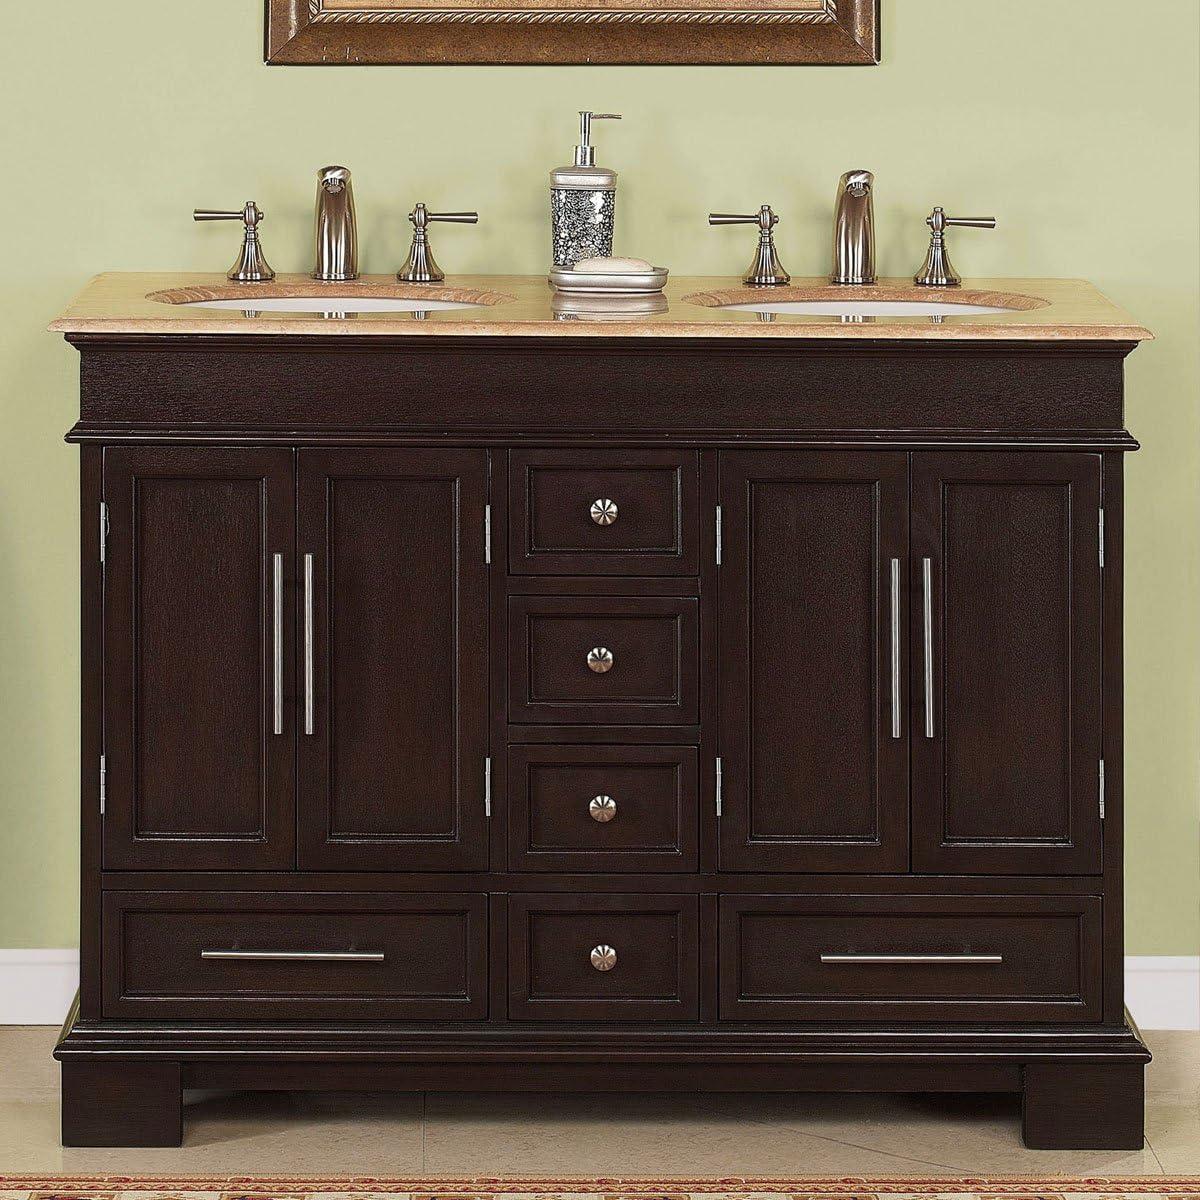 Silkroad Exclusive Countertop Travertine Compact Small Sink Bathroom Vanity with Cabinet, 48 , Dark Wood